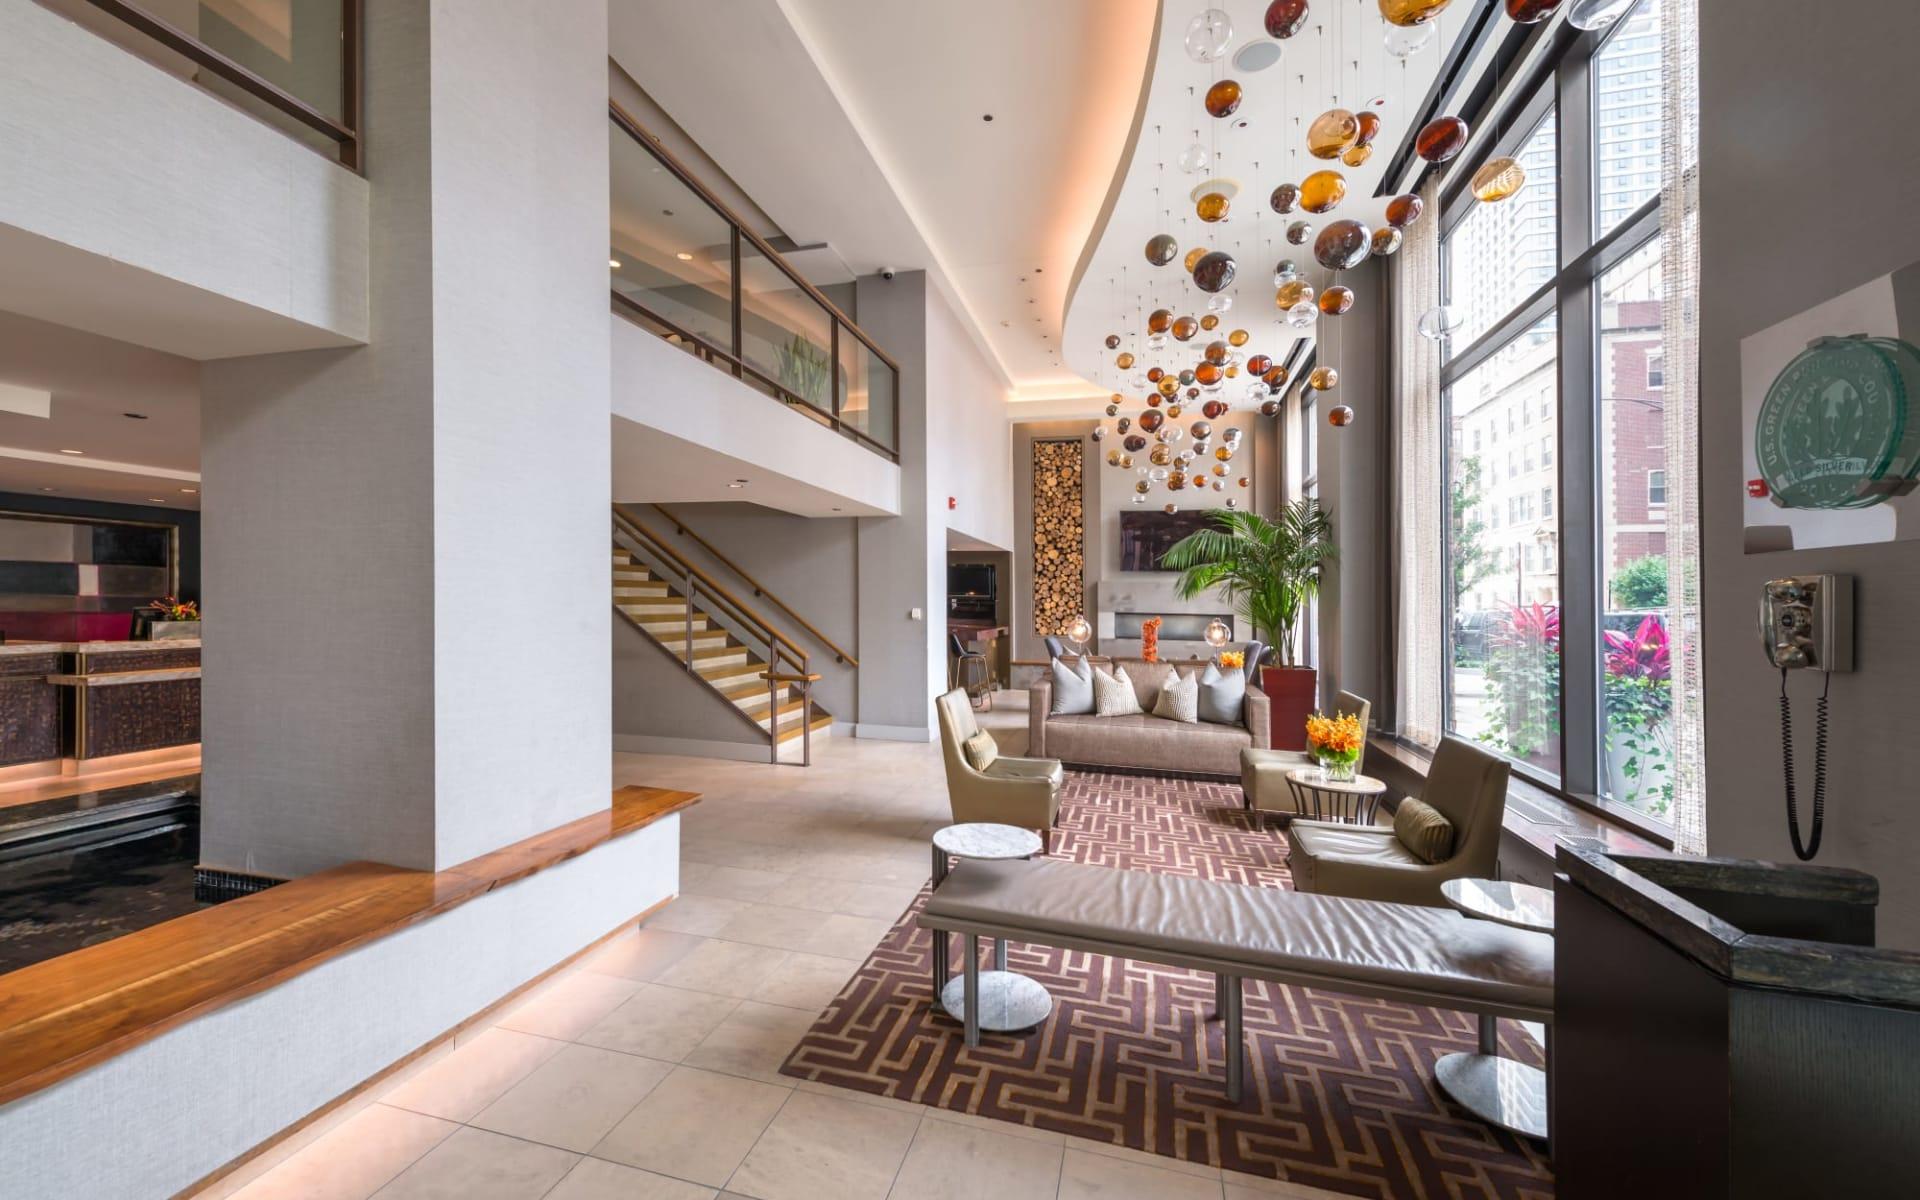 Hotel Felix in Chicago: Facilities_Hotel Felix_Lobby_ATI